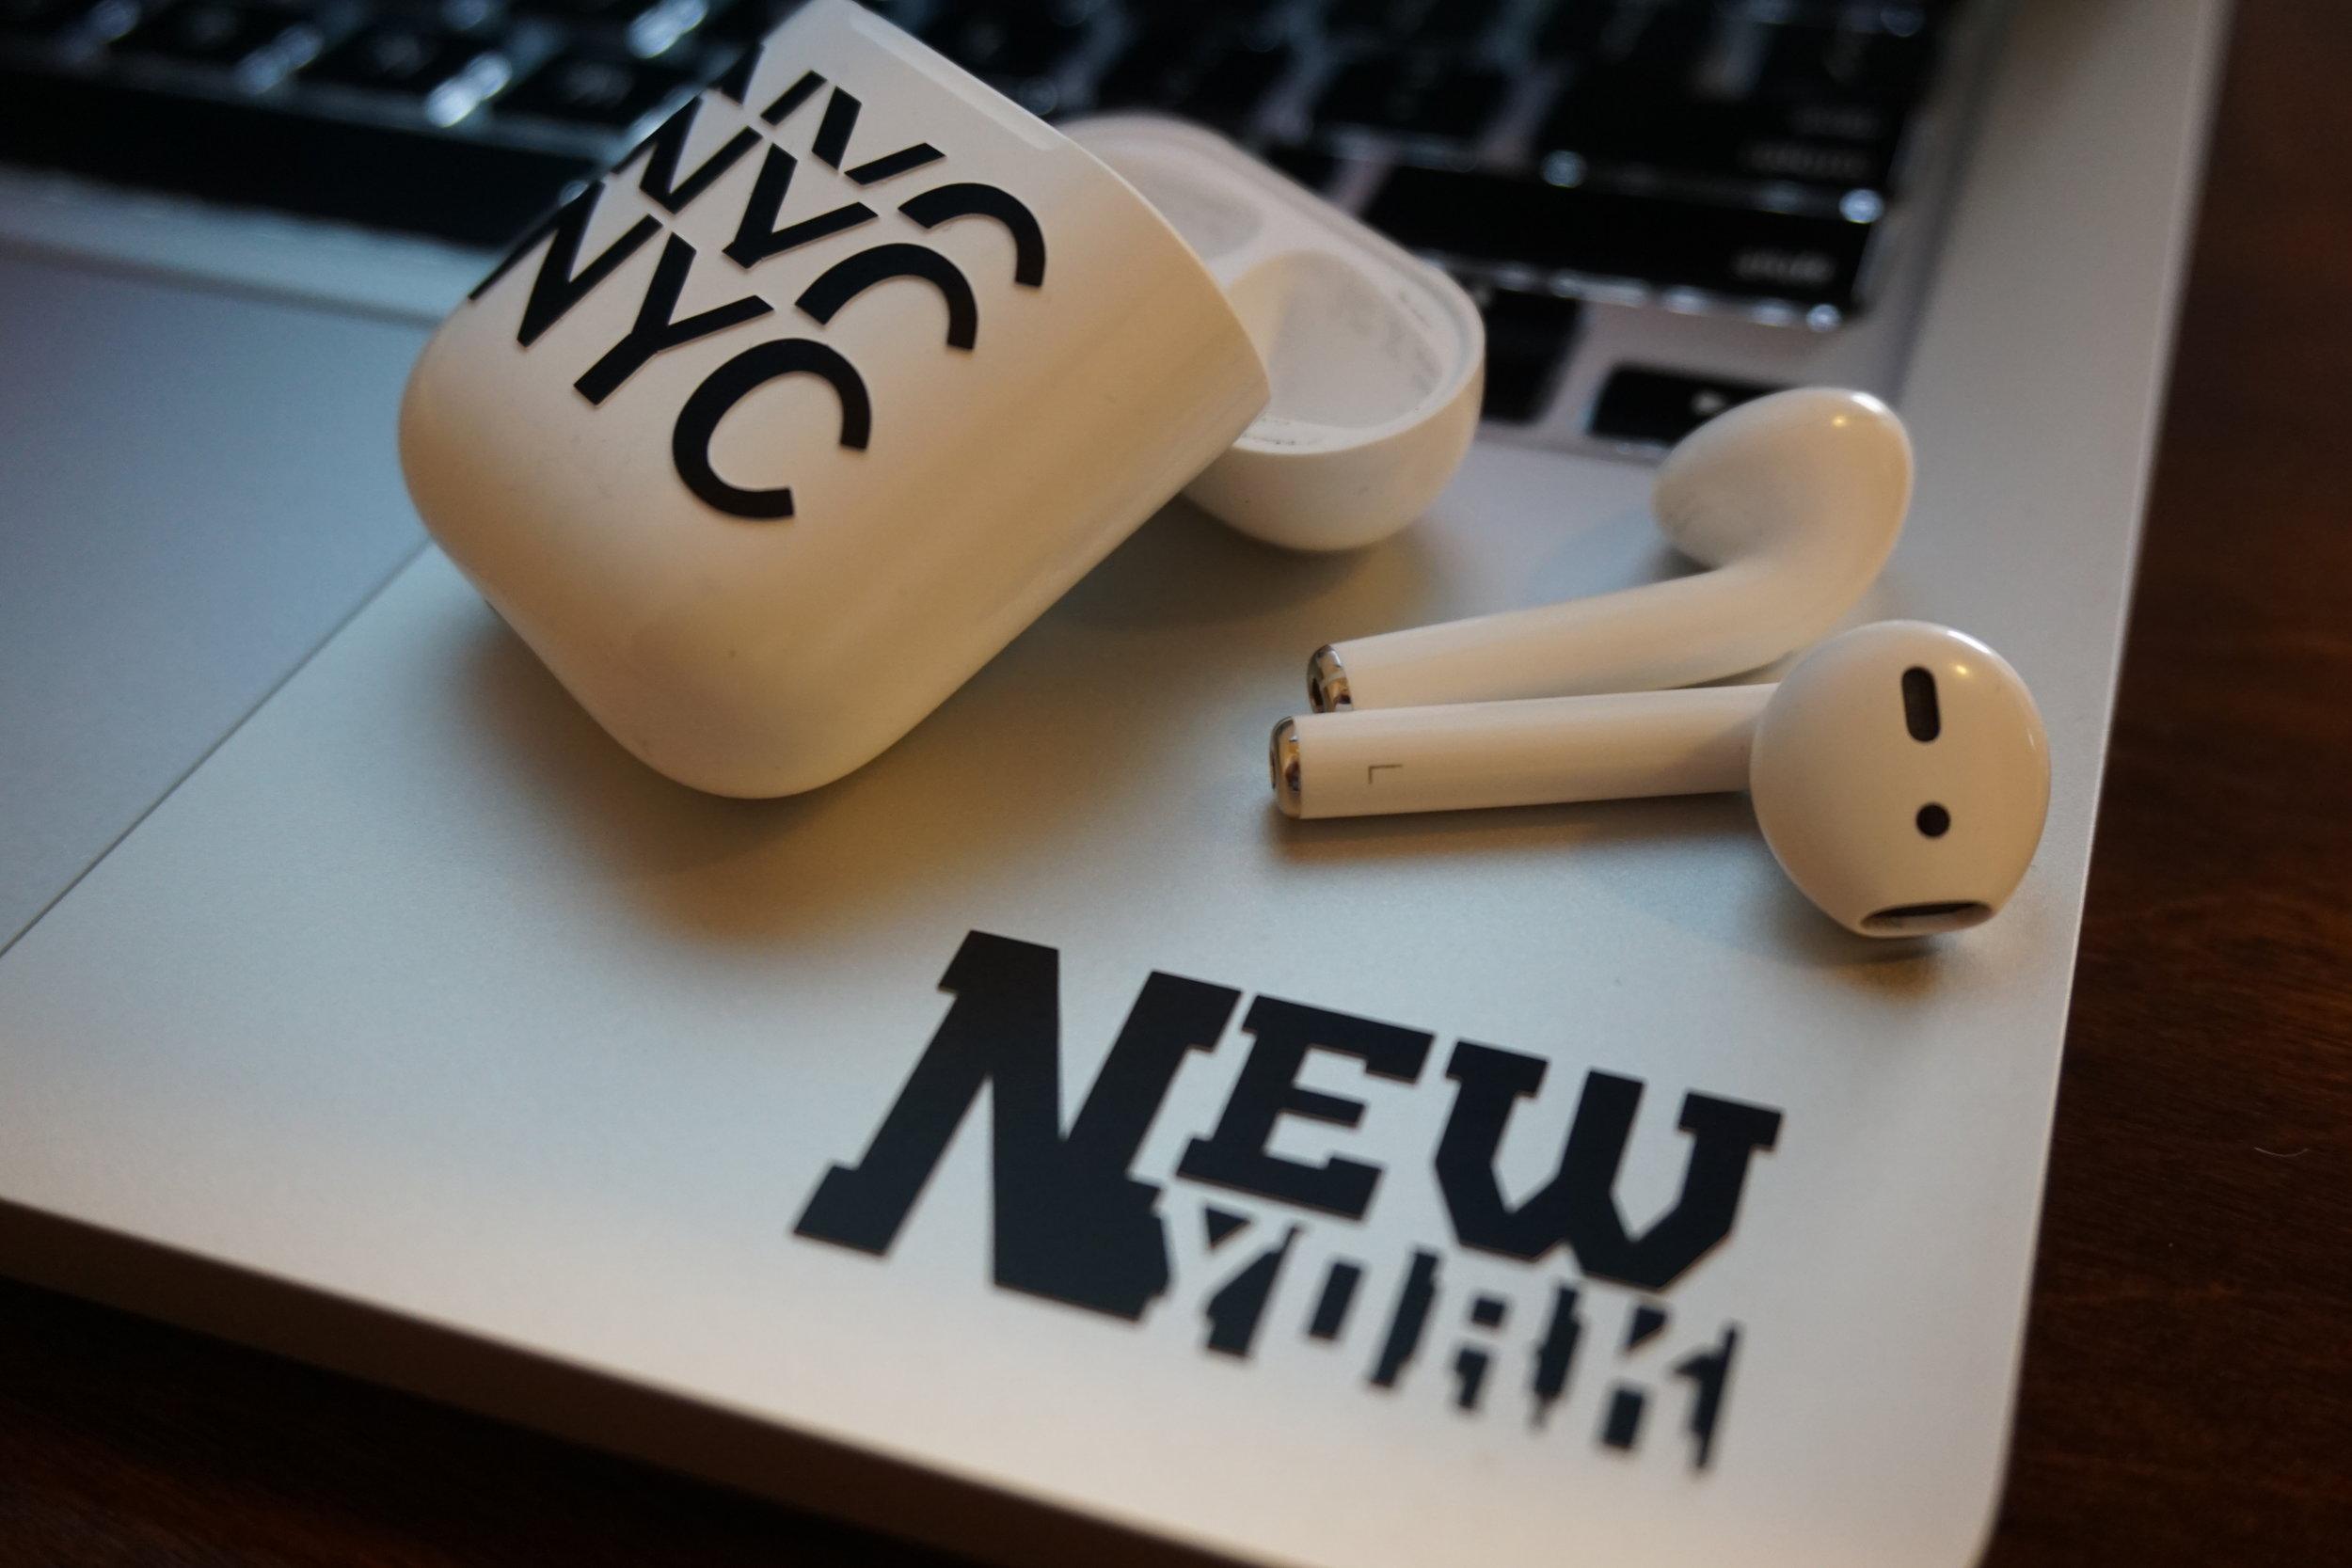 airpods-macbook-decal-accessory